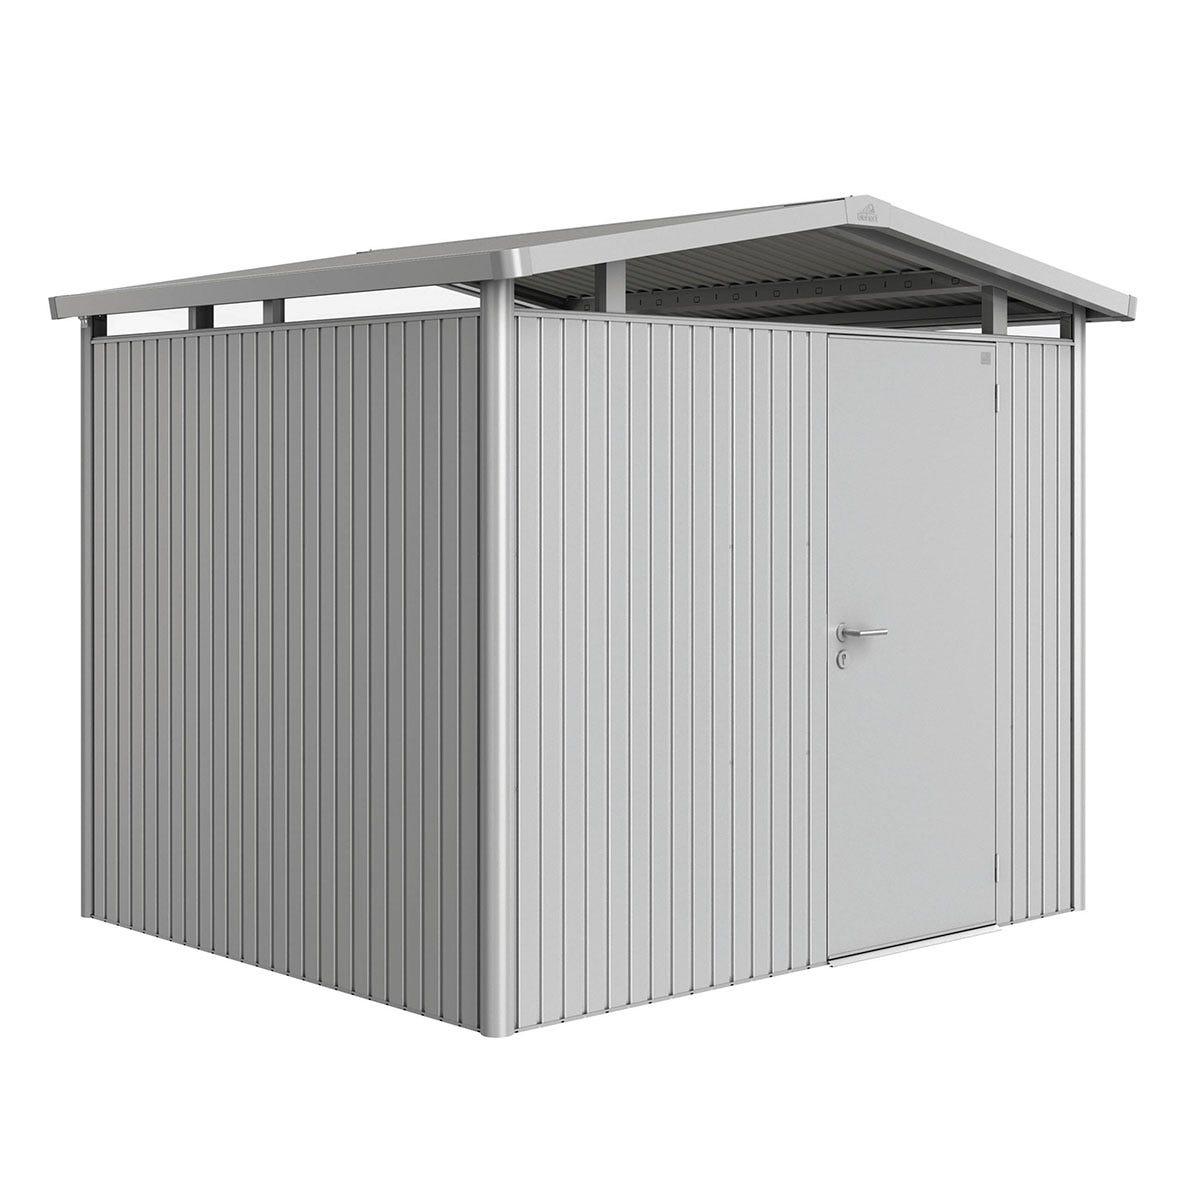 Biohort Panorama Metal Shed P3 Standard Door 9' x 7' 8'' - Metallic Silver